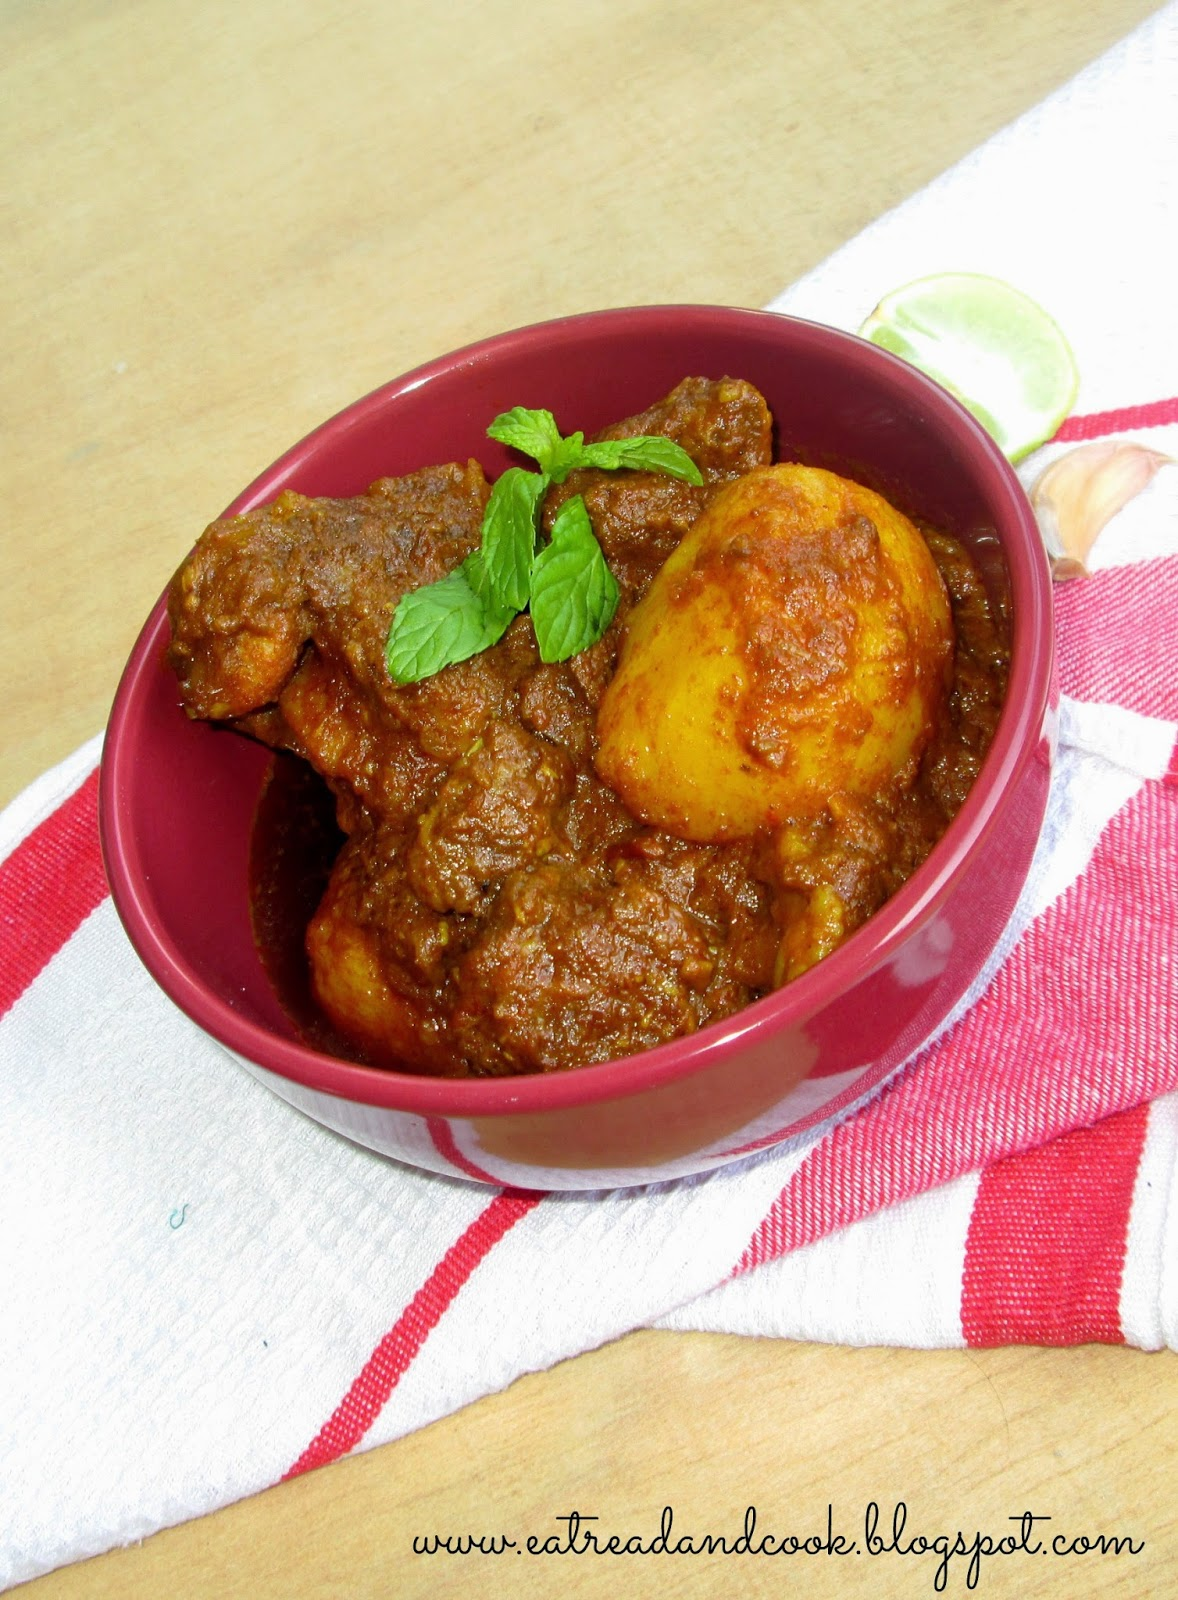 Kasha Mangsho / Mutton Kasha / Bengali Style Dry Mutton Curry, Kasha Mangsho / Mutton Kasha / Bengali Style Dry Mutton Curry recipe, how to cook Kasha Mangsho / Mutton Kasha / Bengali Style Dry Mutton Curry, how to make Kasha Mangsho / Mutton Kasha / Bengali Style Dry Mutton Curry